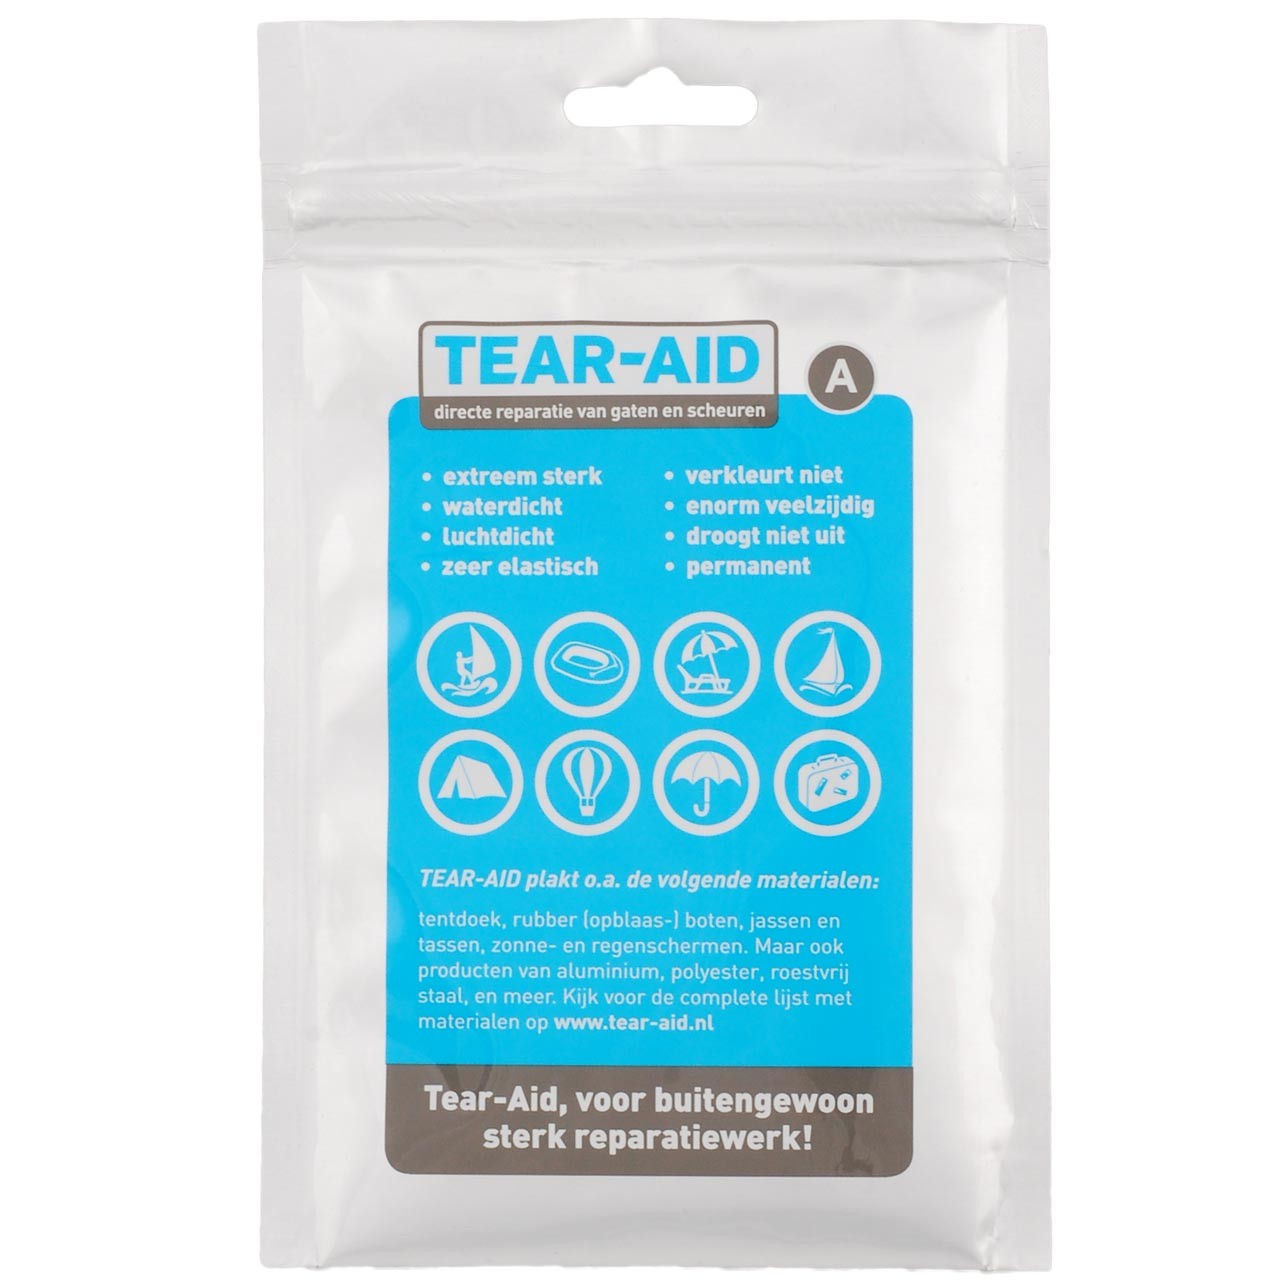 Tear-Aid reparatie